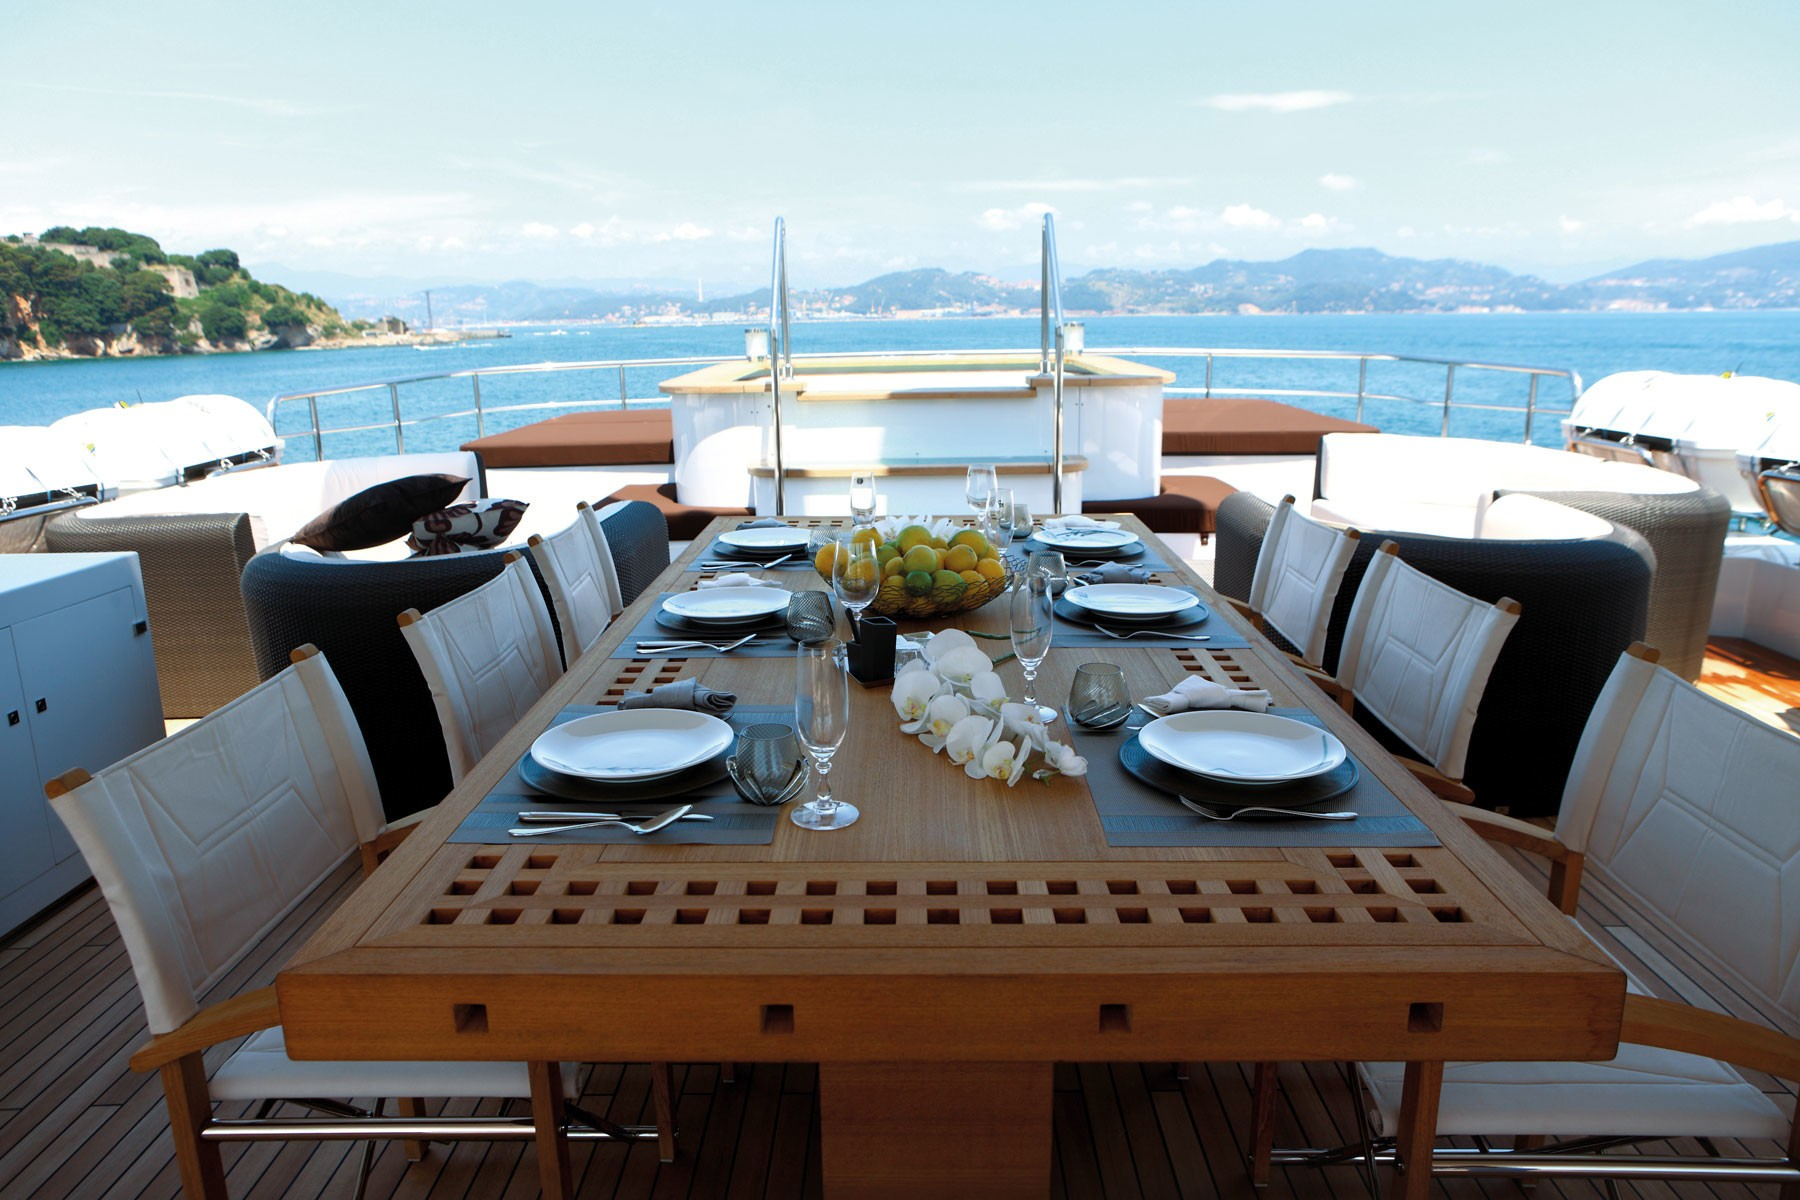 Eating/dining Top Deck Aboard Yacht ZALIV III